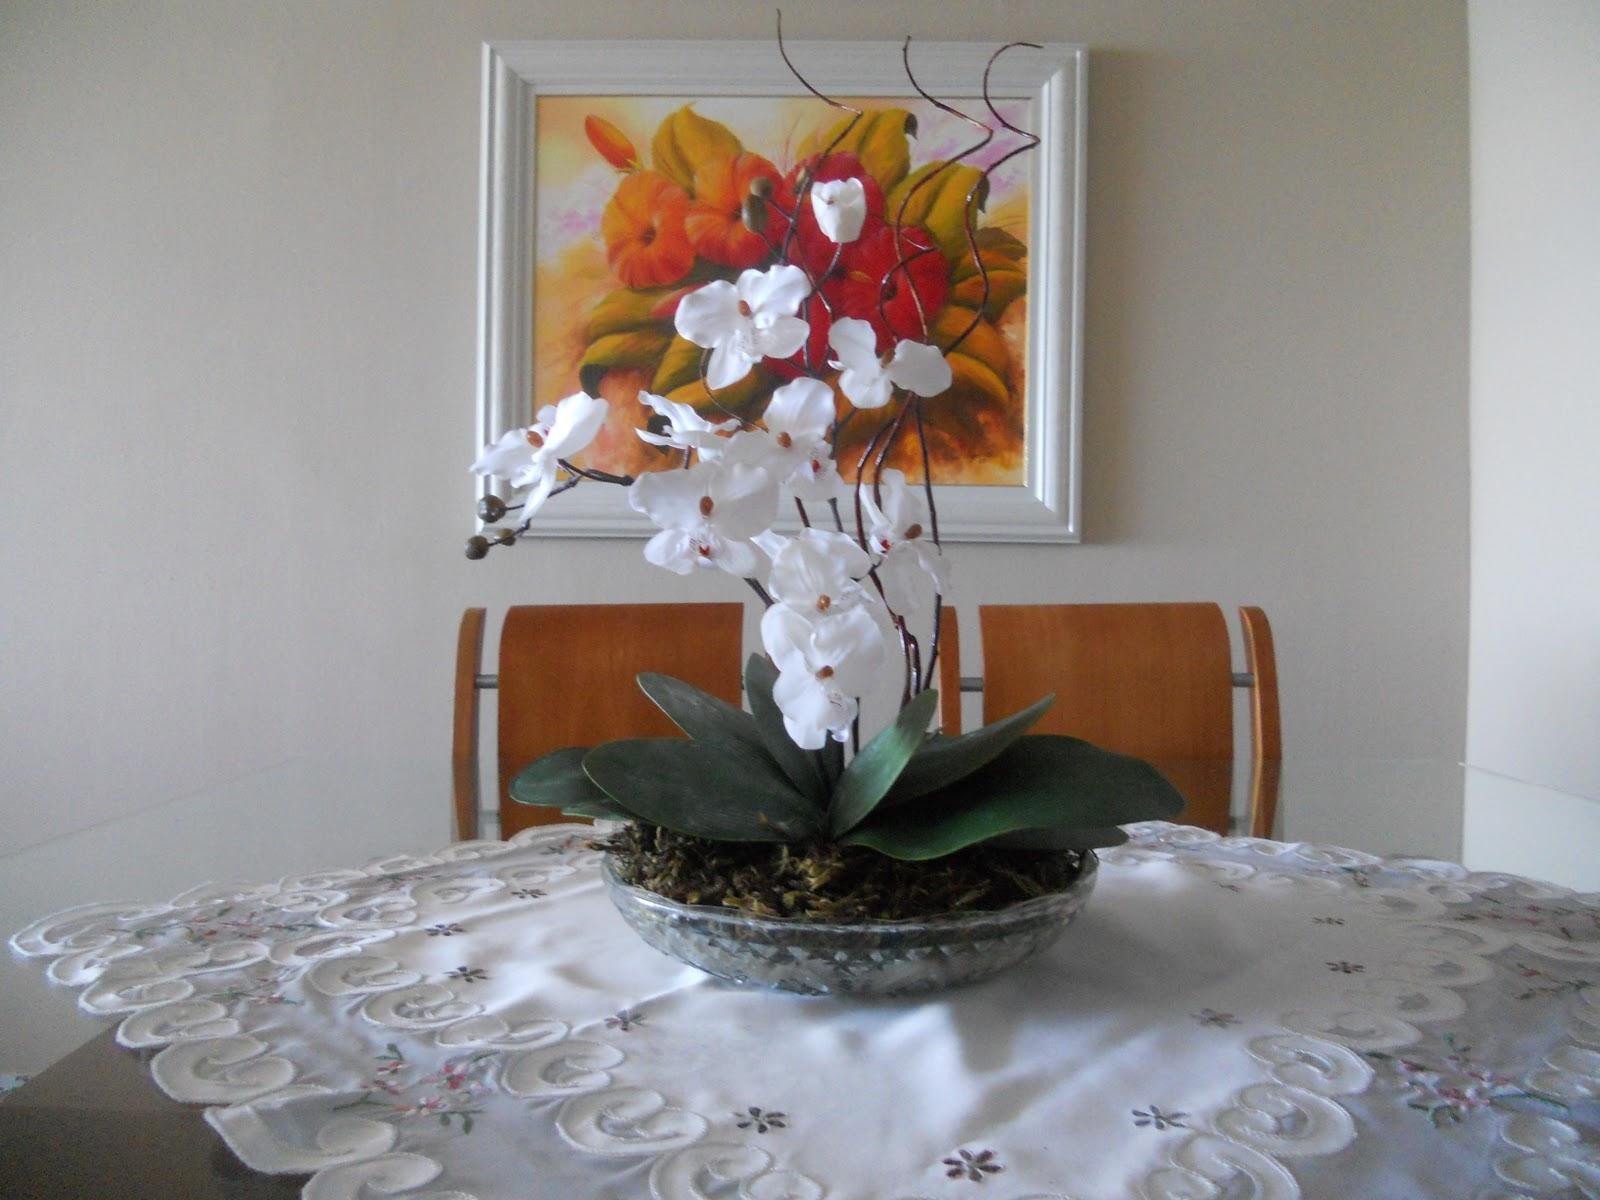 Casa Farol: Arranjo novo pra mesa de jantar #733B22 1600x1200